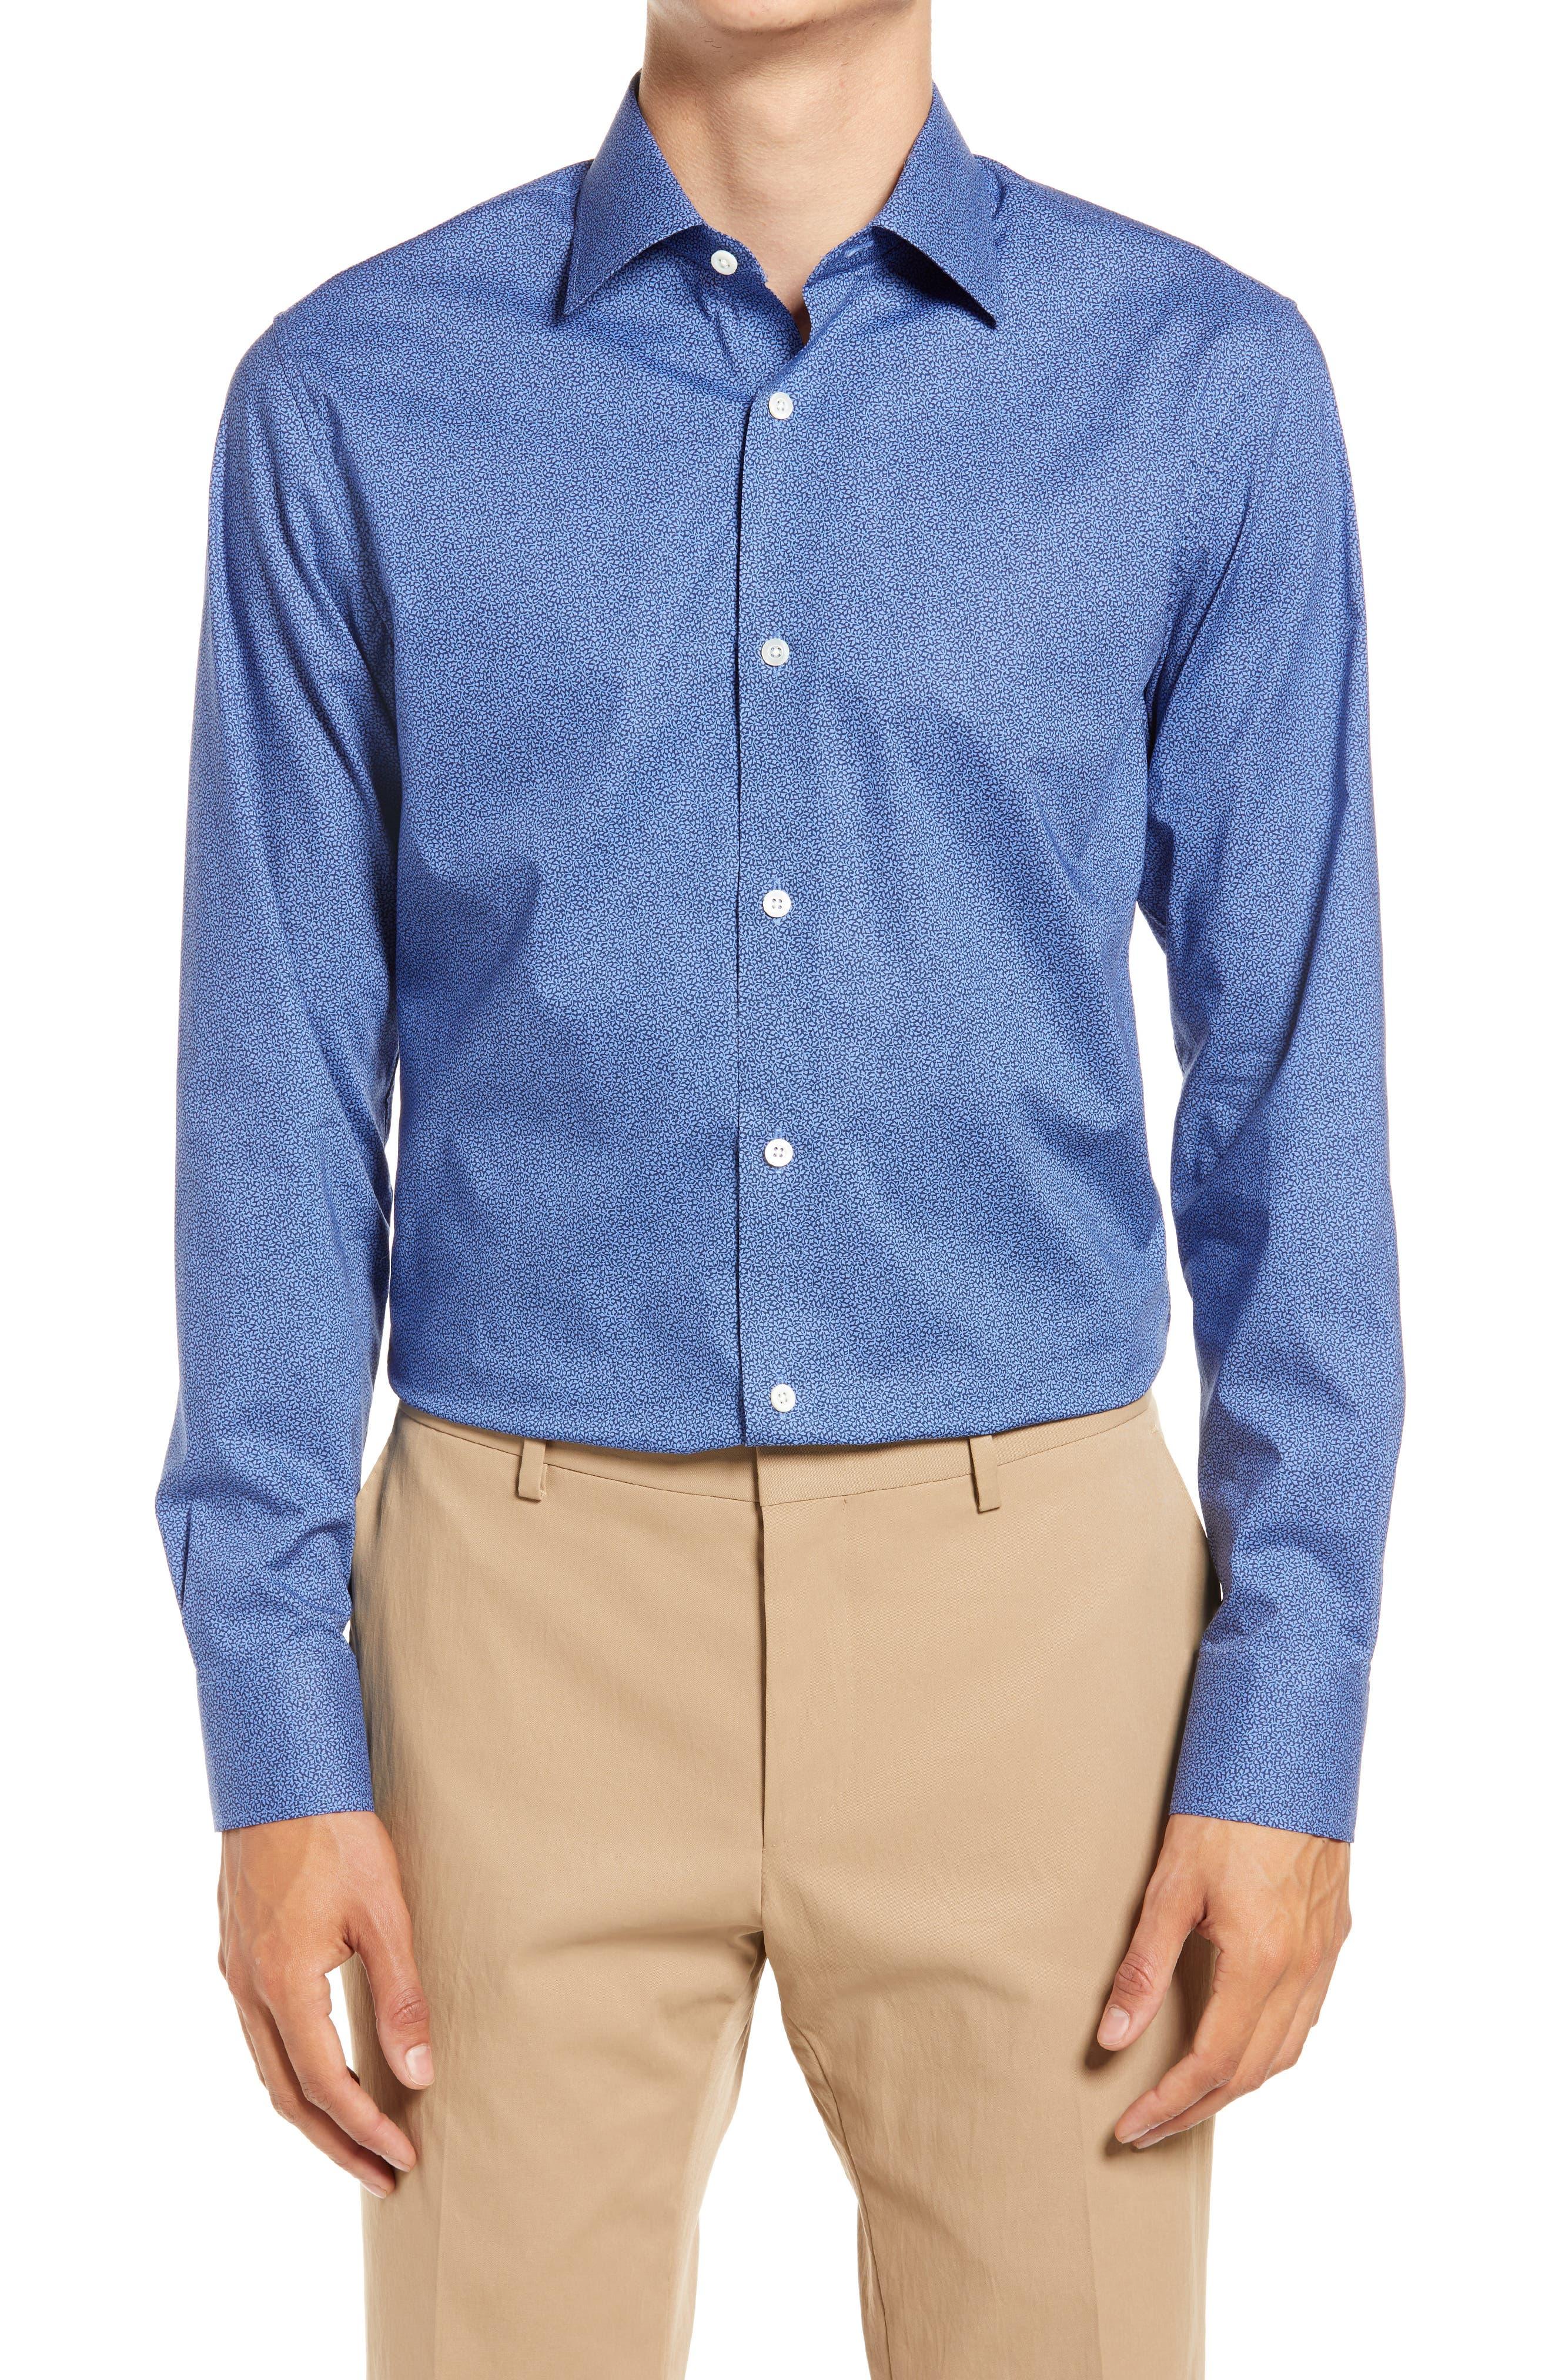 Jetsetter Slim Fit Vine Stretch Dress Shirt